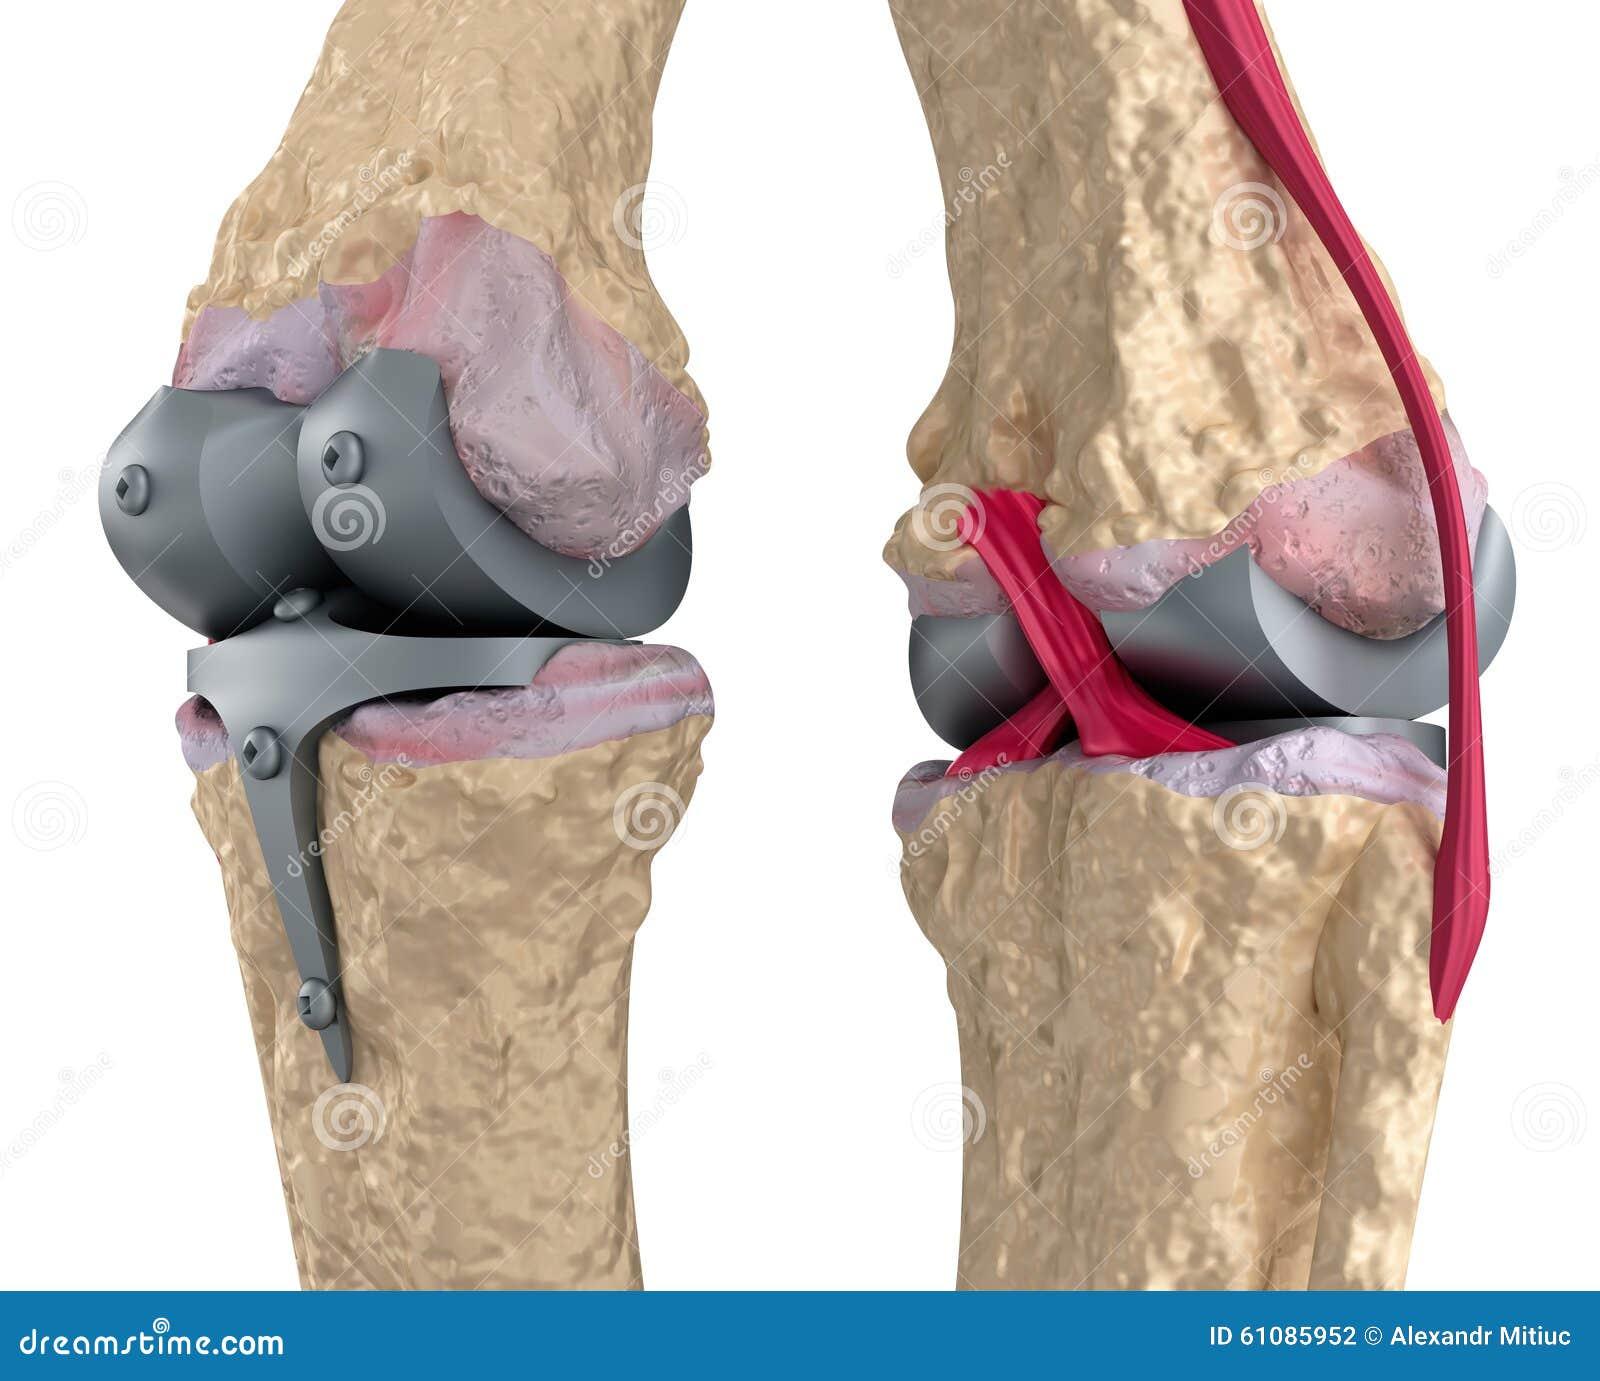 Knee And Titanium Hinge Joint. Stock Illustration - Image ... Hinge Joint Knee